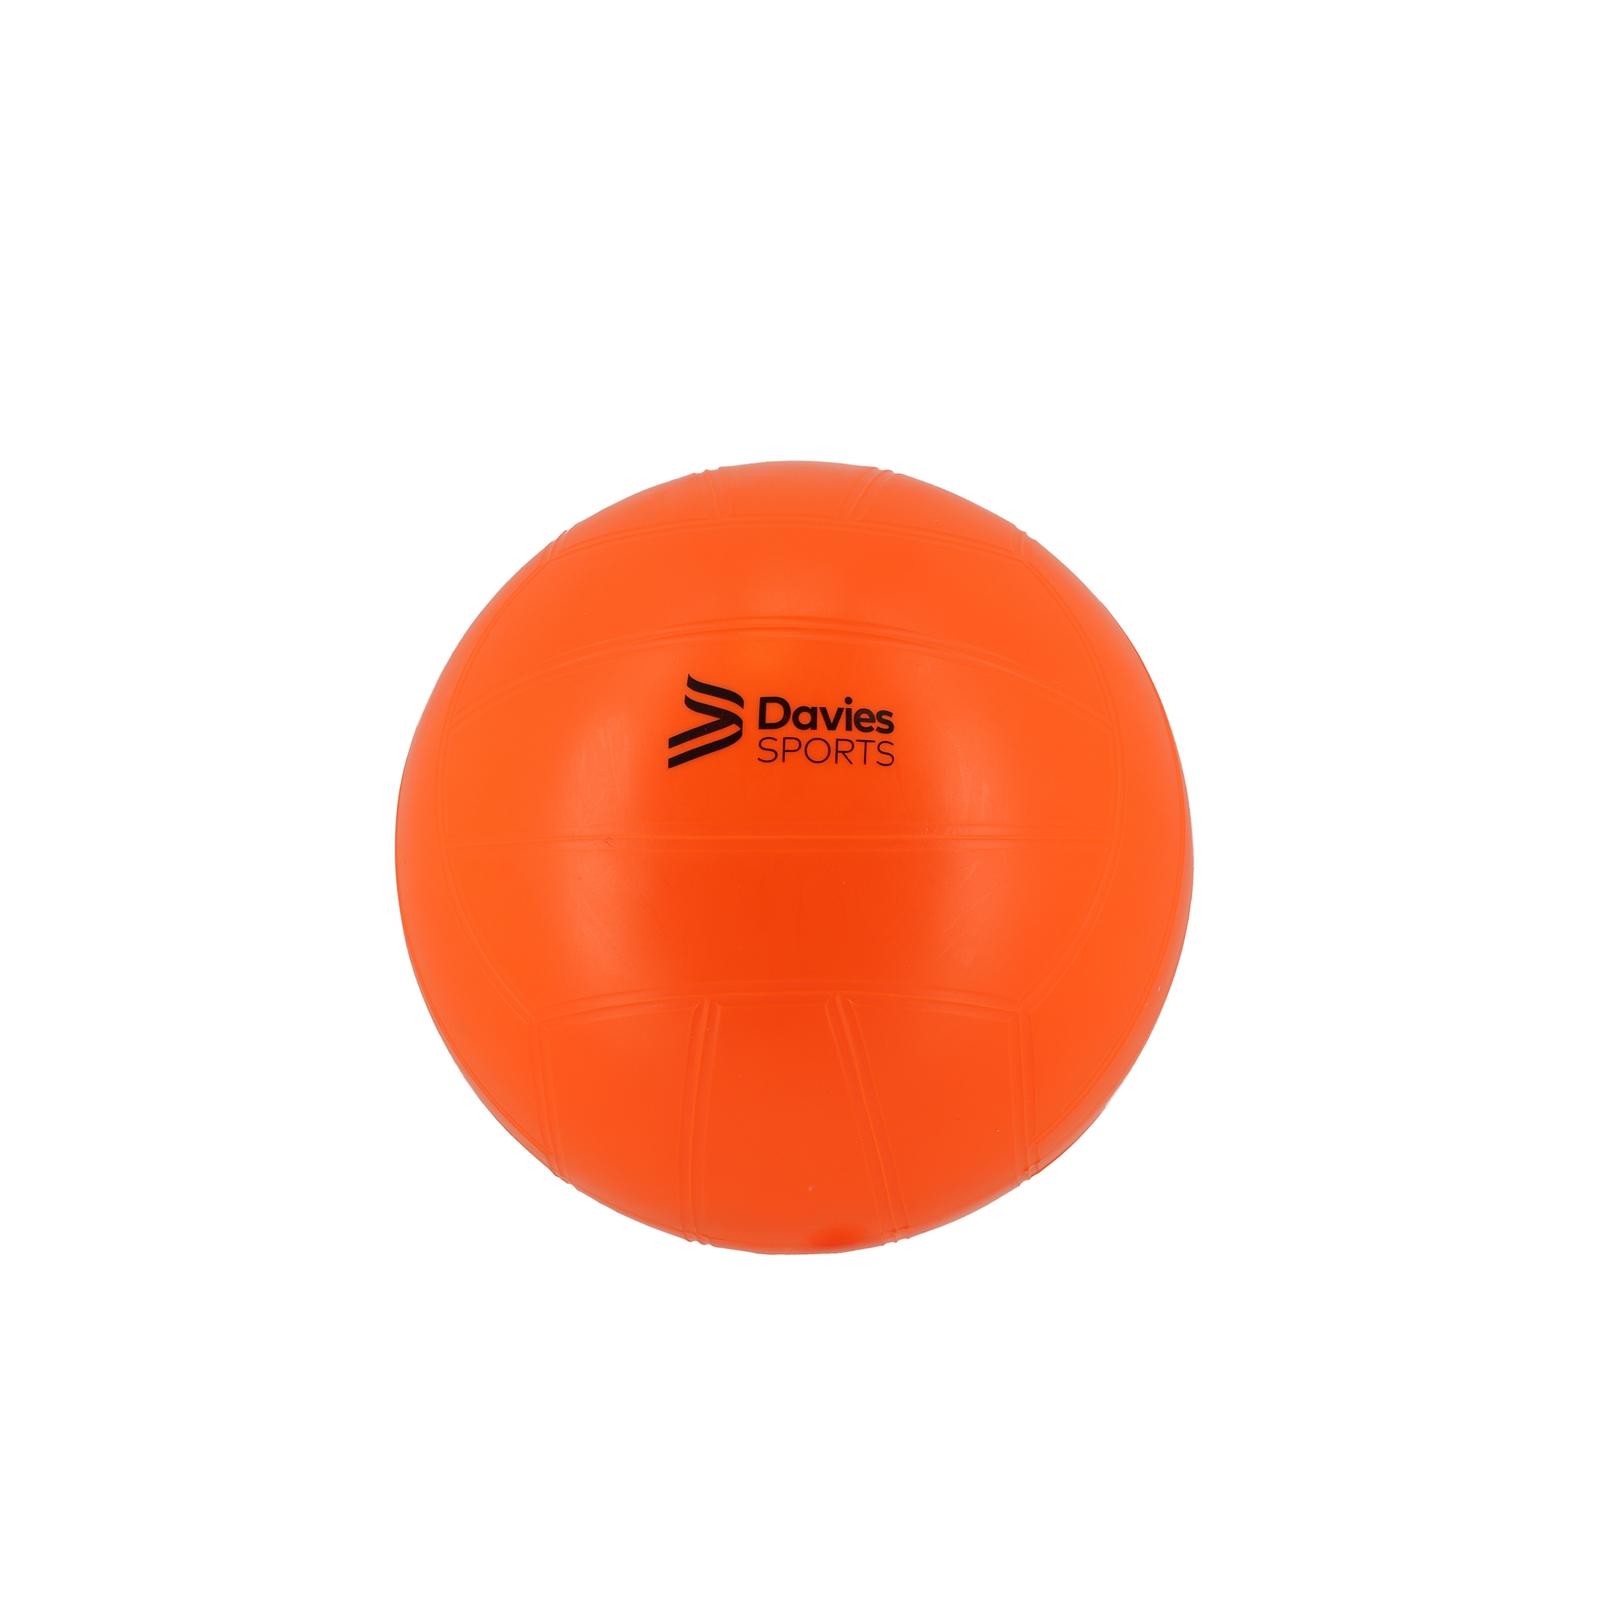 PVC Practice Football Size 4